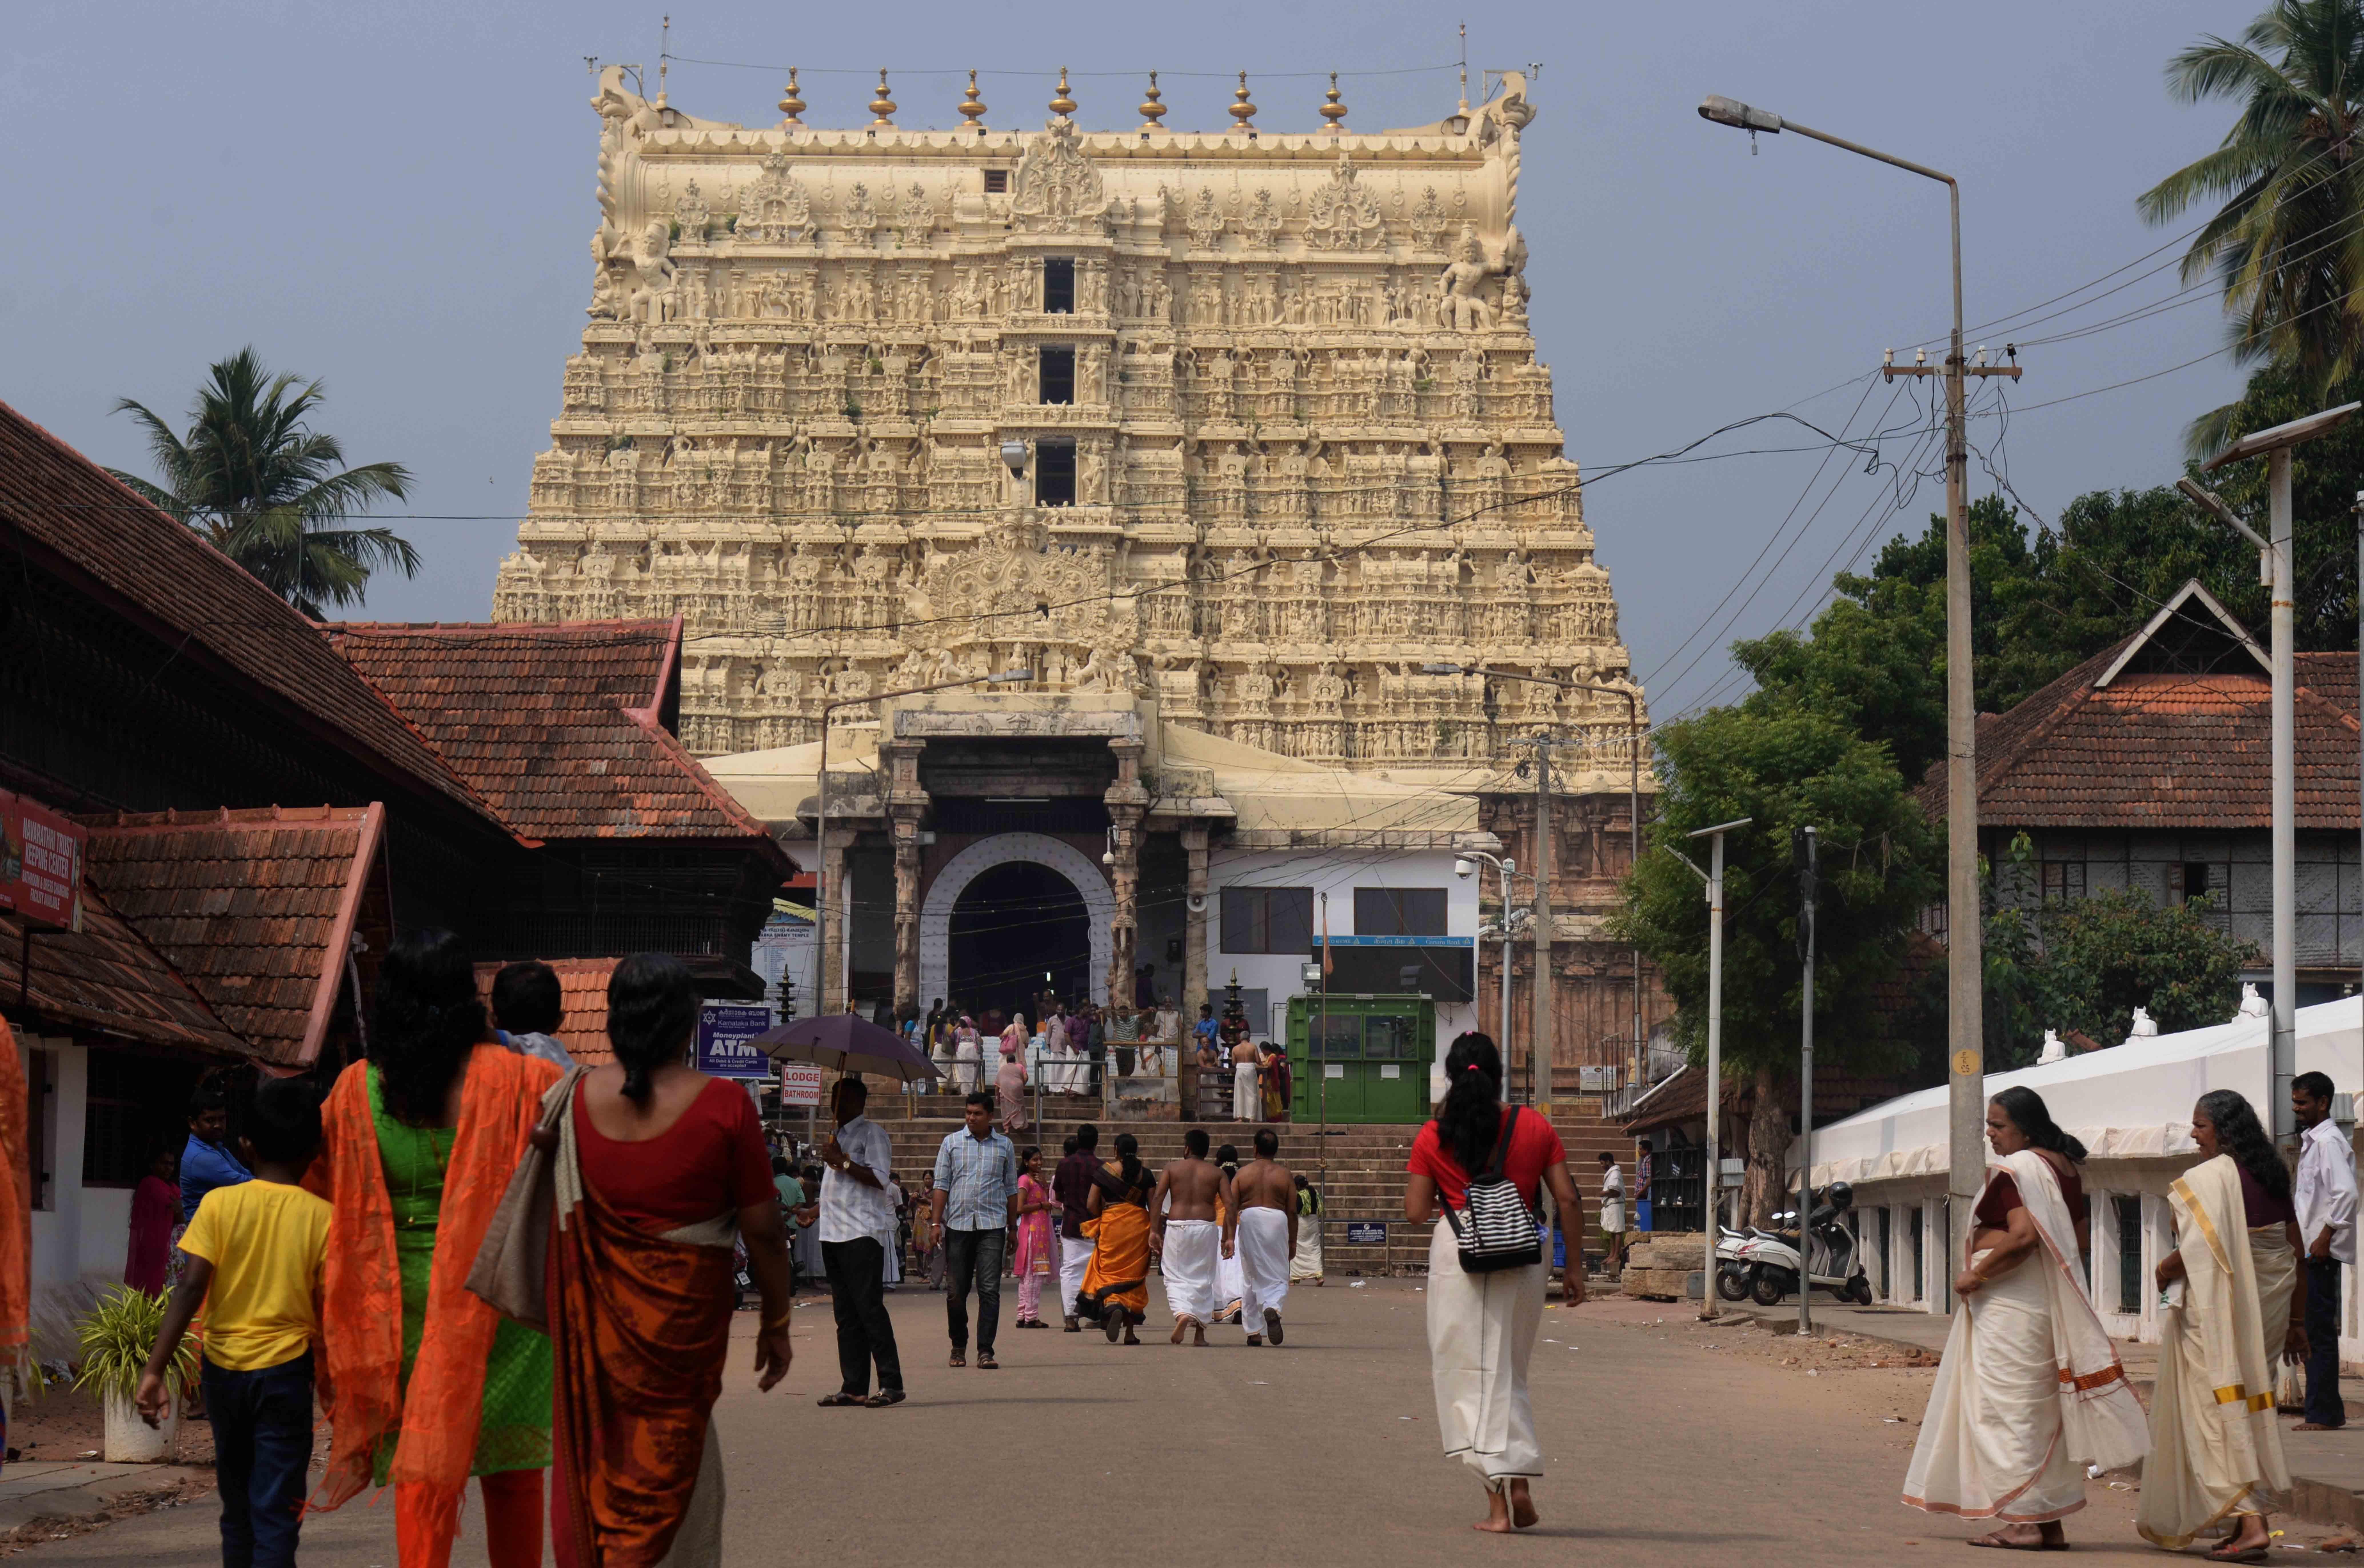 Sri vishnu temple in bangalore dating 4